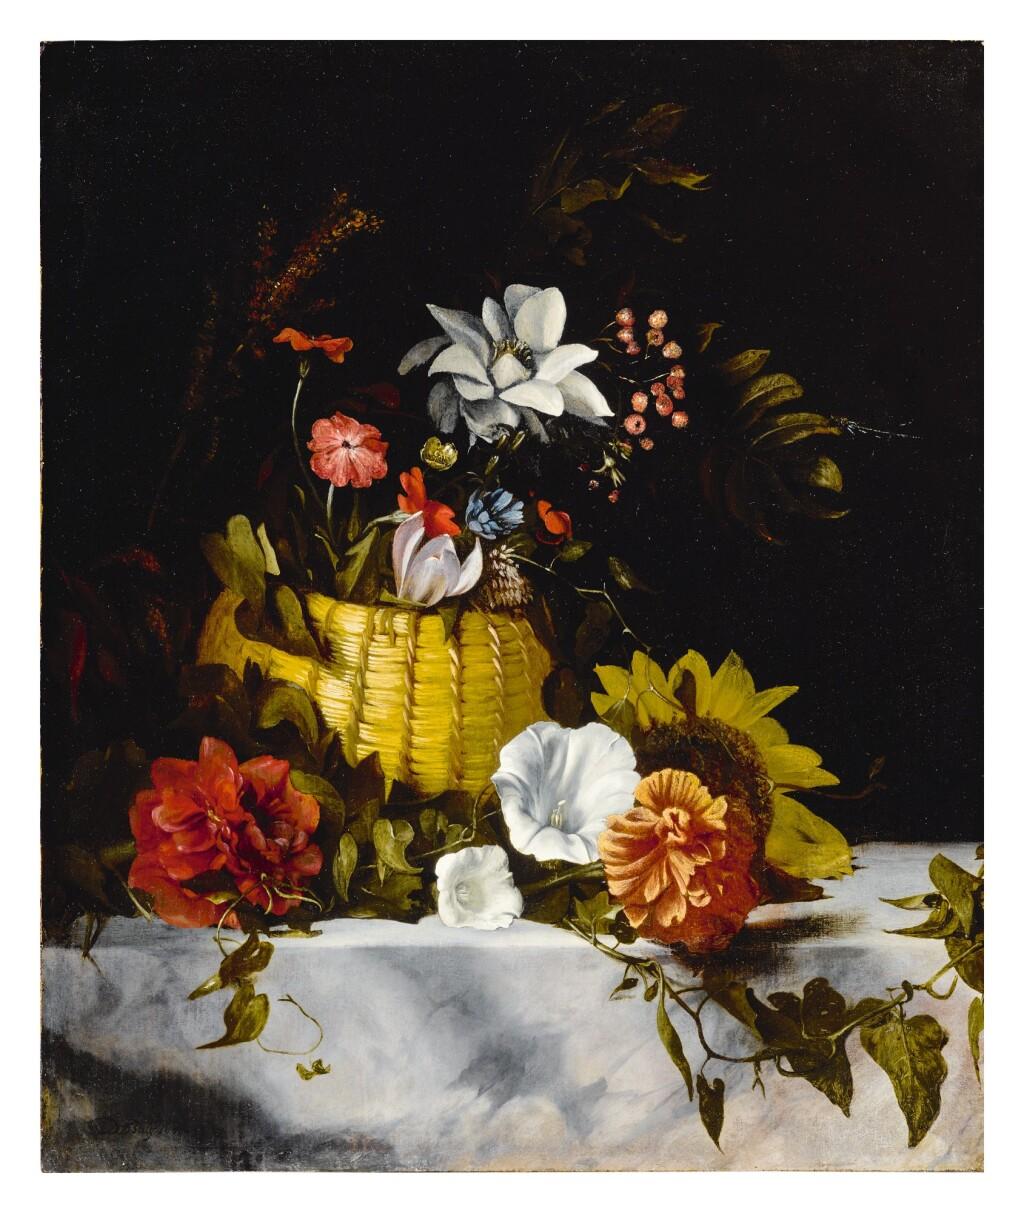 DIRCK DE BRAY     STILL LIFE OF A BASKET OF FLOWERS ON A LARGE MARBLE LEDGE